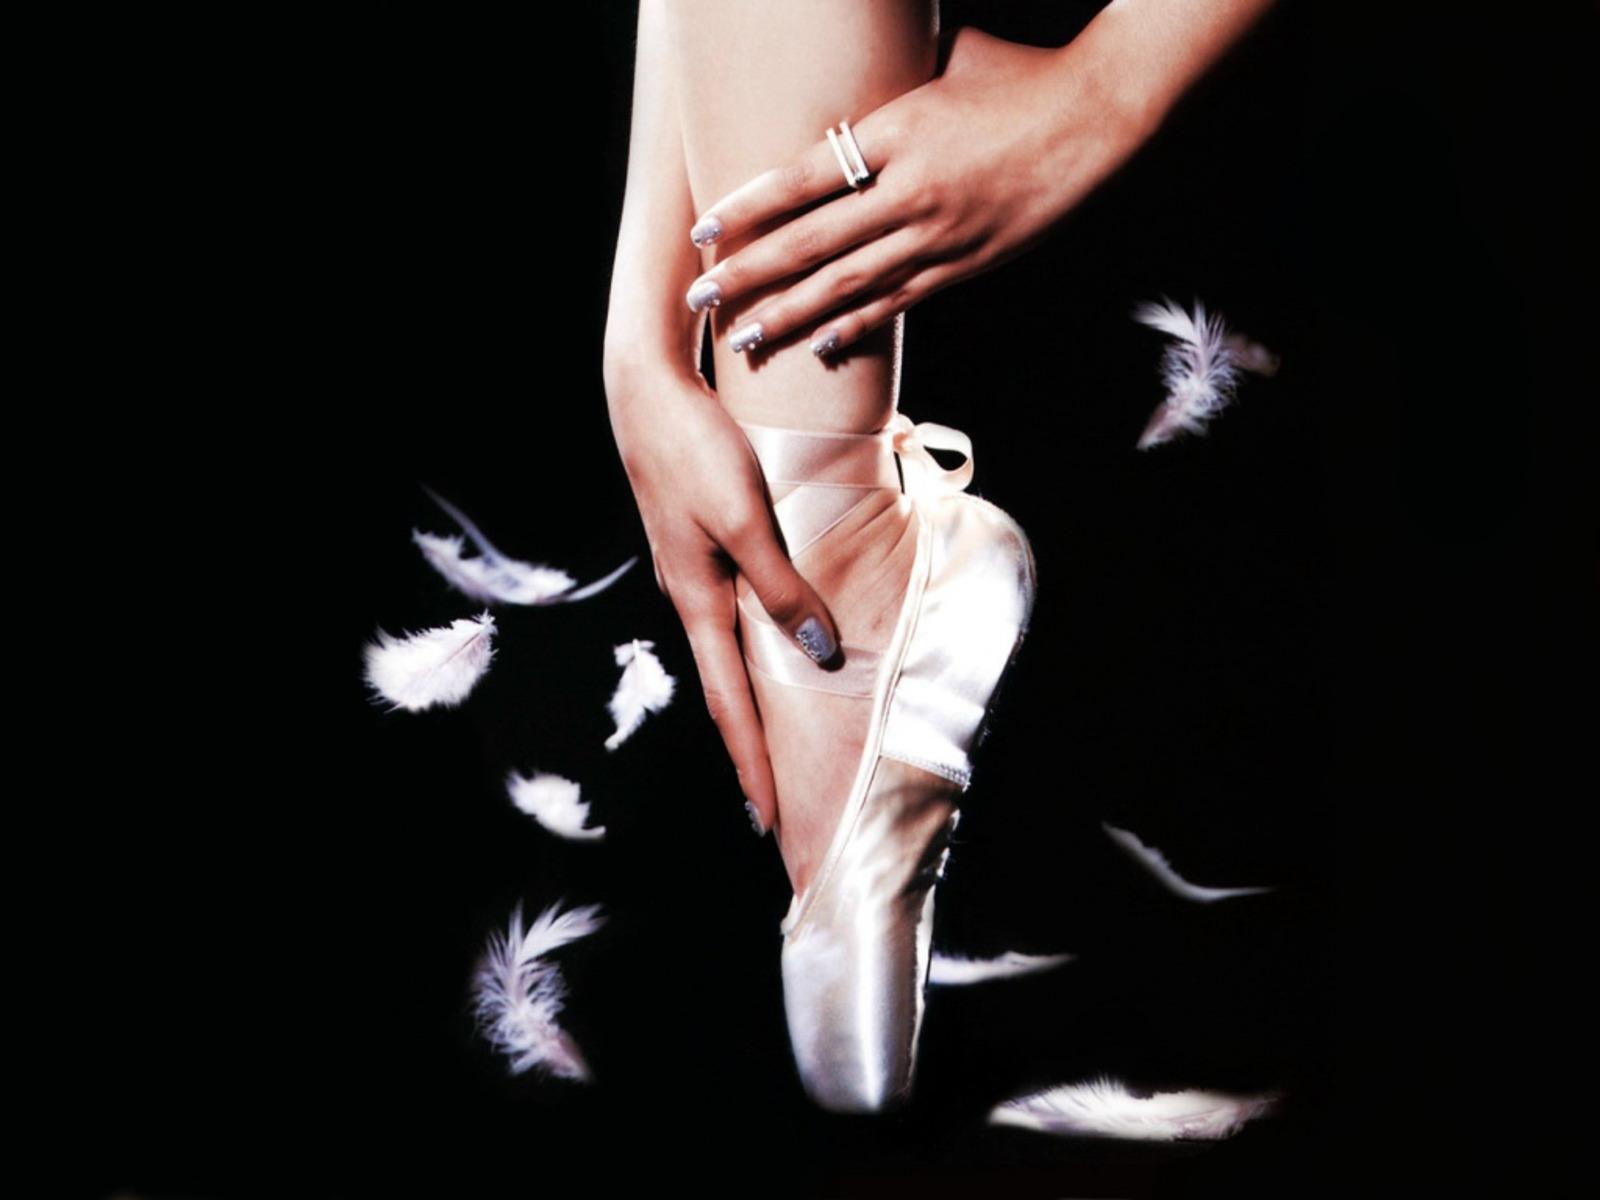 Ballet Dancer Wallpaper - WallpaperSafari